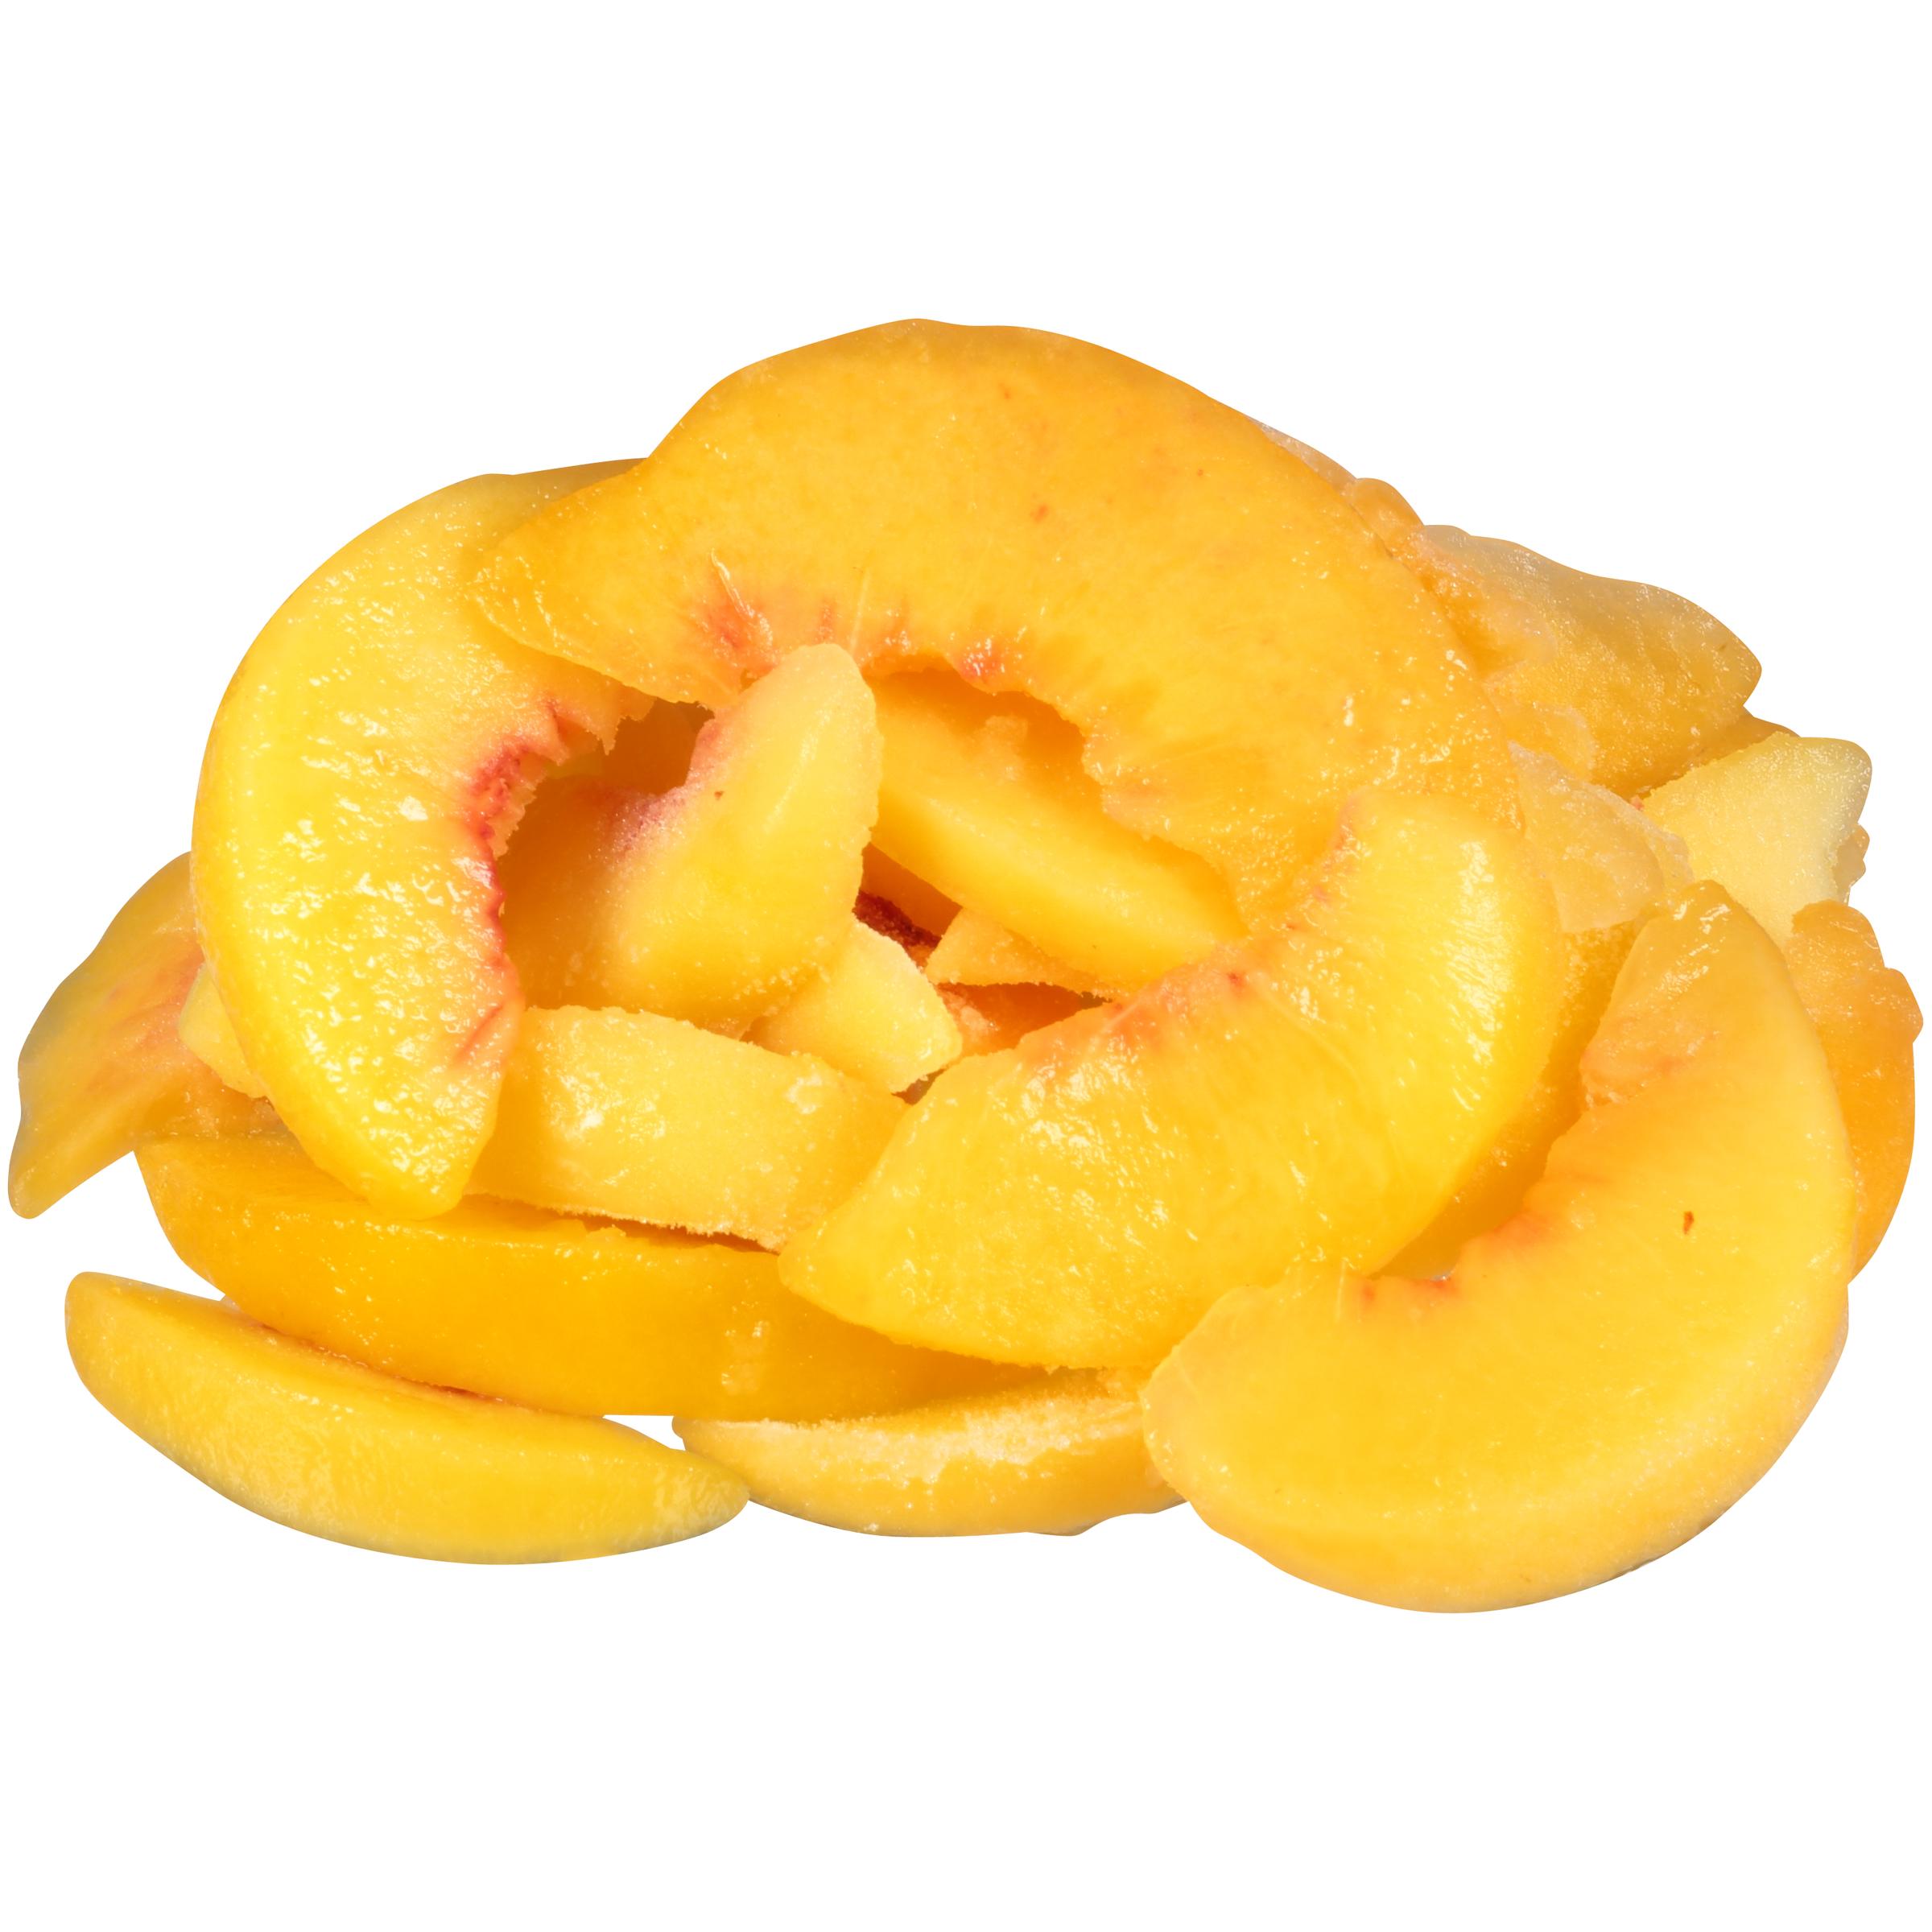 Peach Fr 30# Sliv Sliced IQF